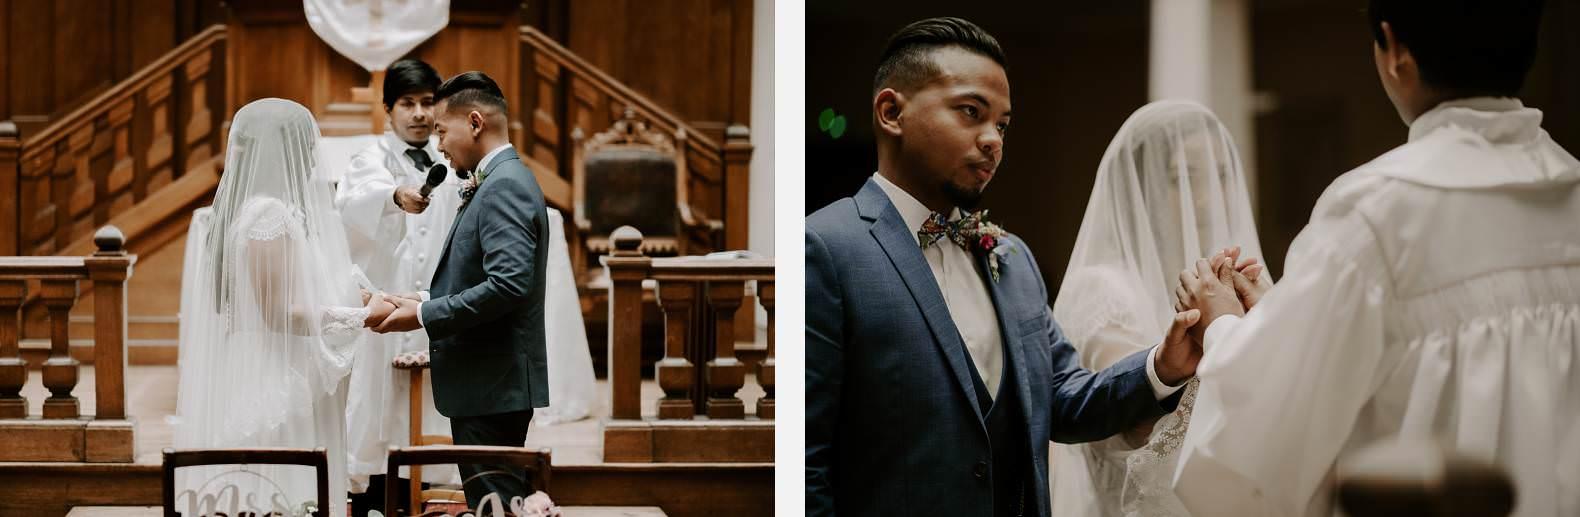 mariage manoir de corny photographe bel esprit 0027 1